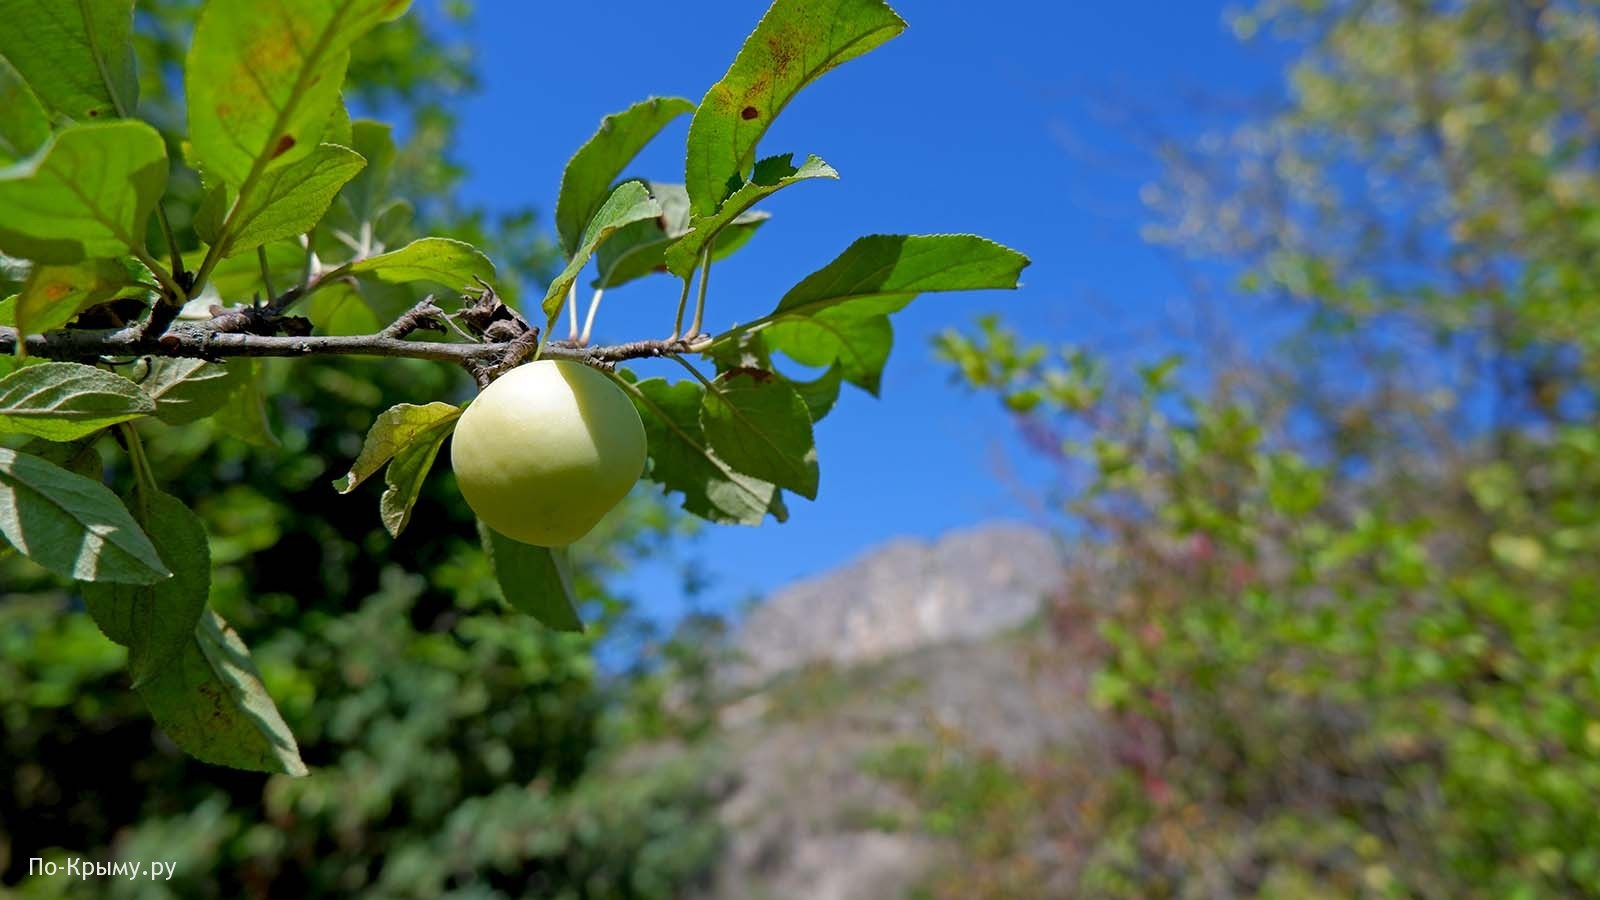 Ущелье Ашлама-Дере, яблоня